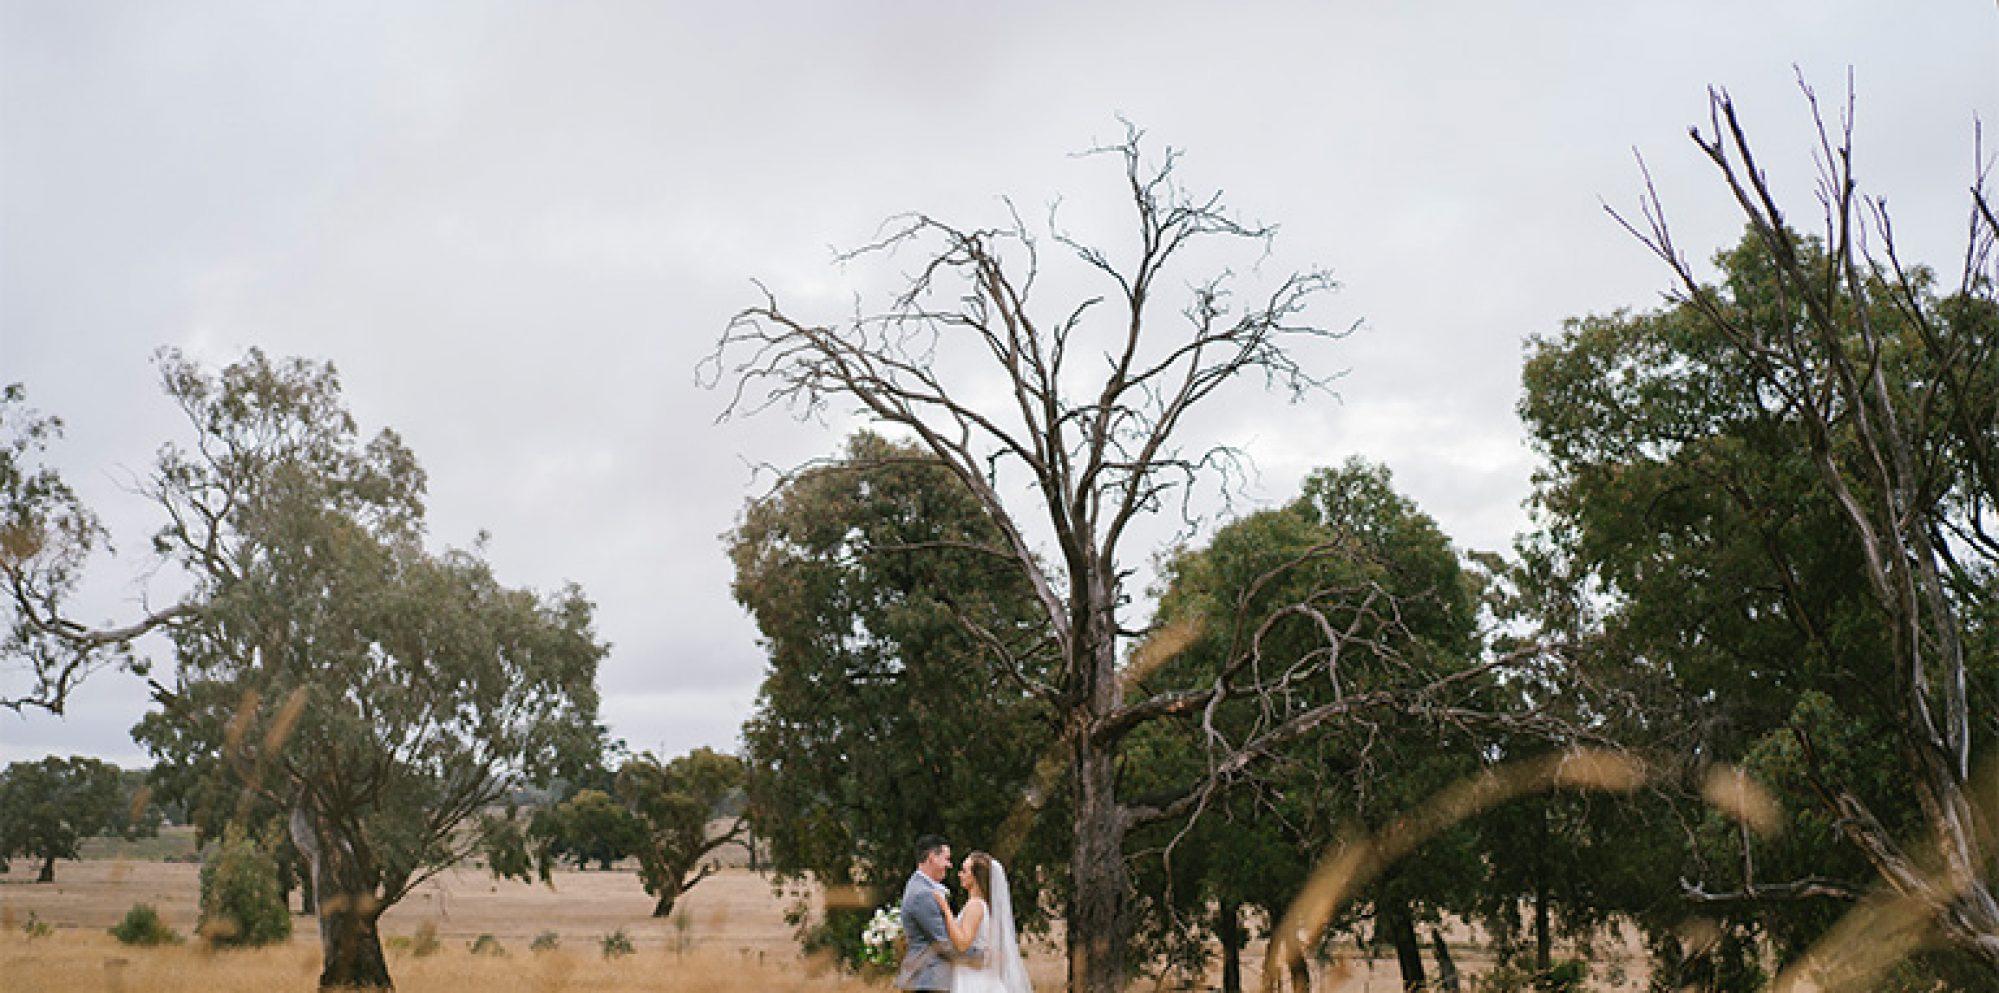 Perri & josh melbourne wedding videography @ eurambeen historic homestead and gardens